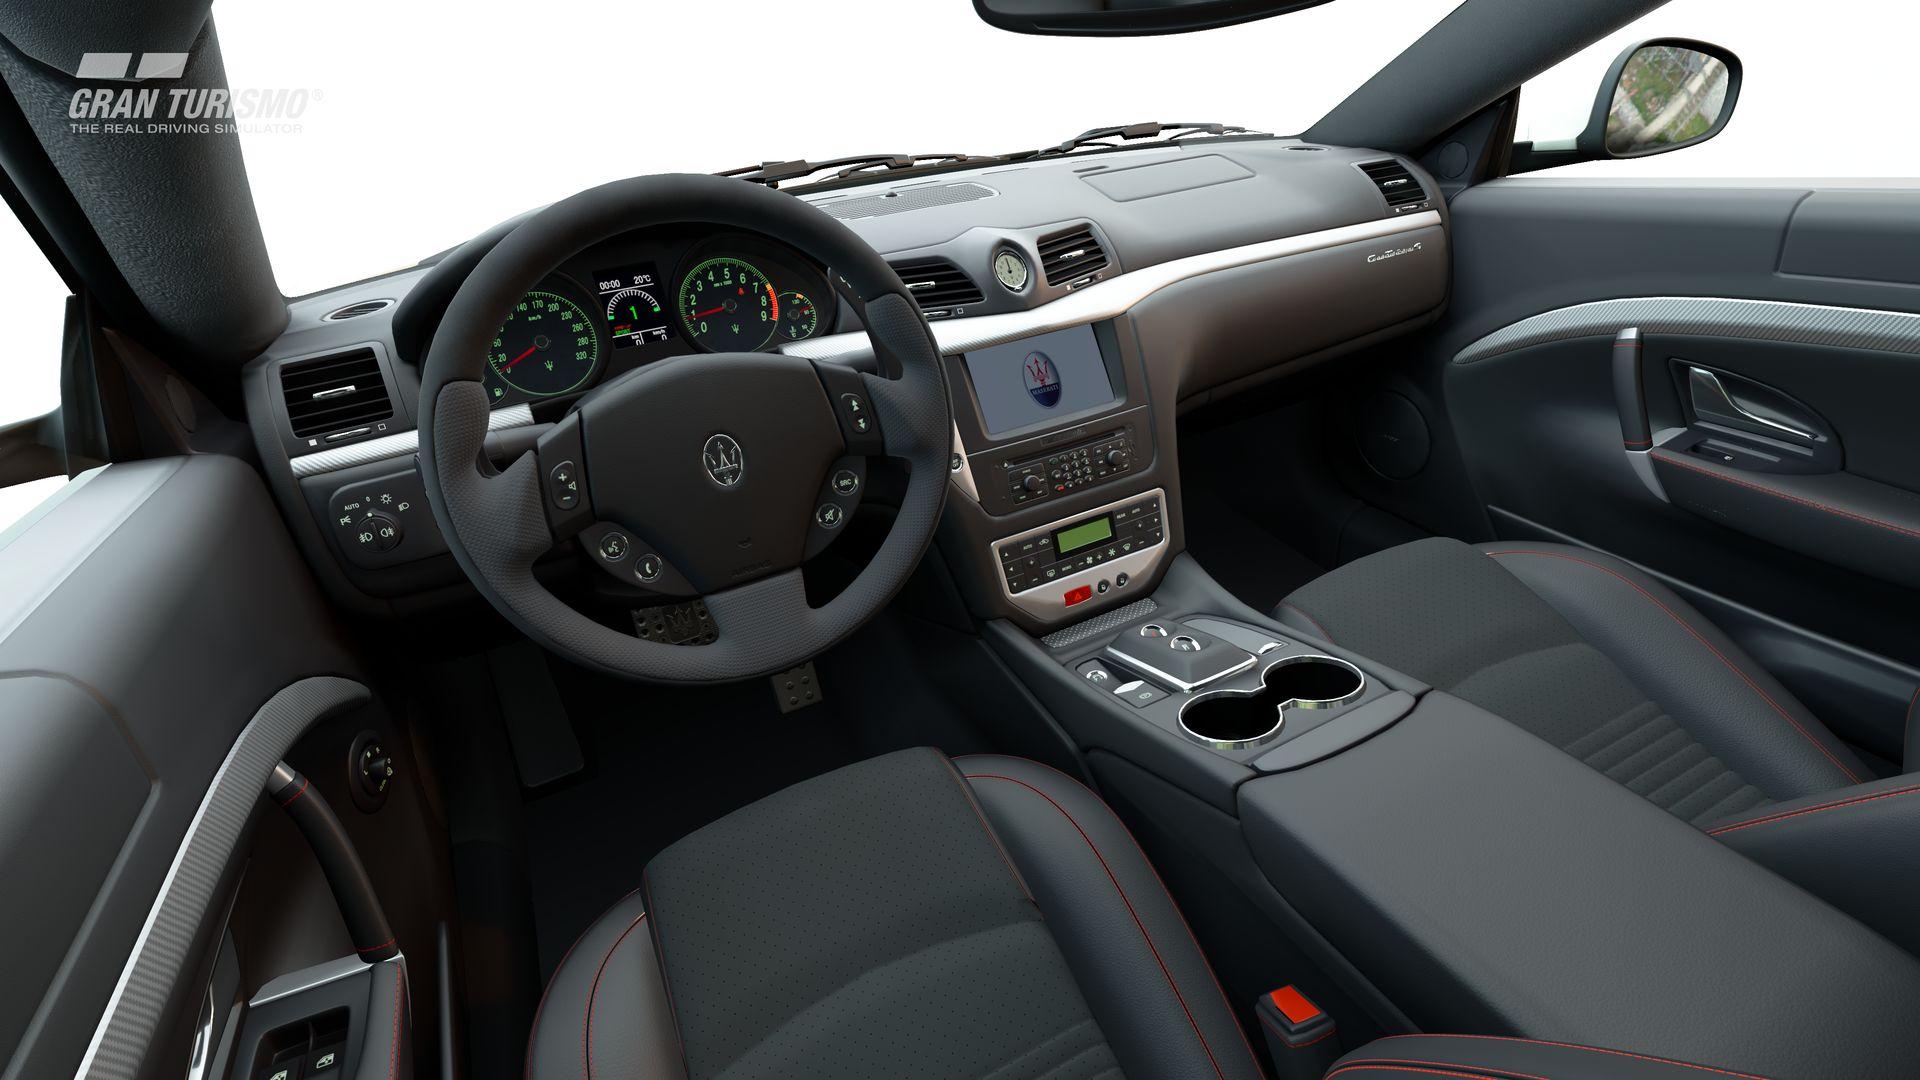 Gran Turismo Sport November Update Maserati GranTurismo S '08 (N400) 4